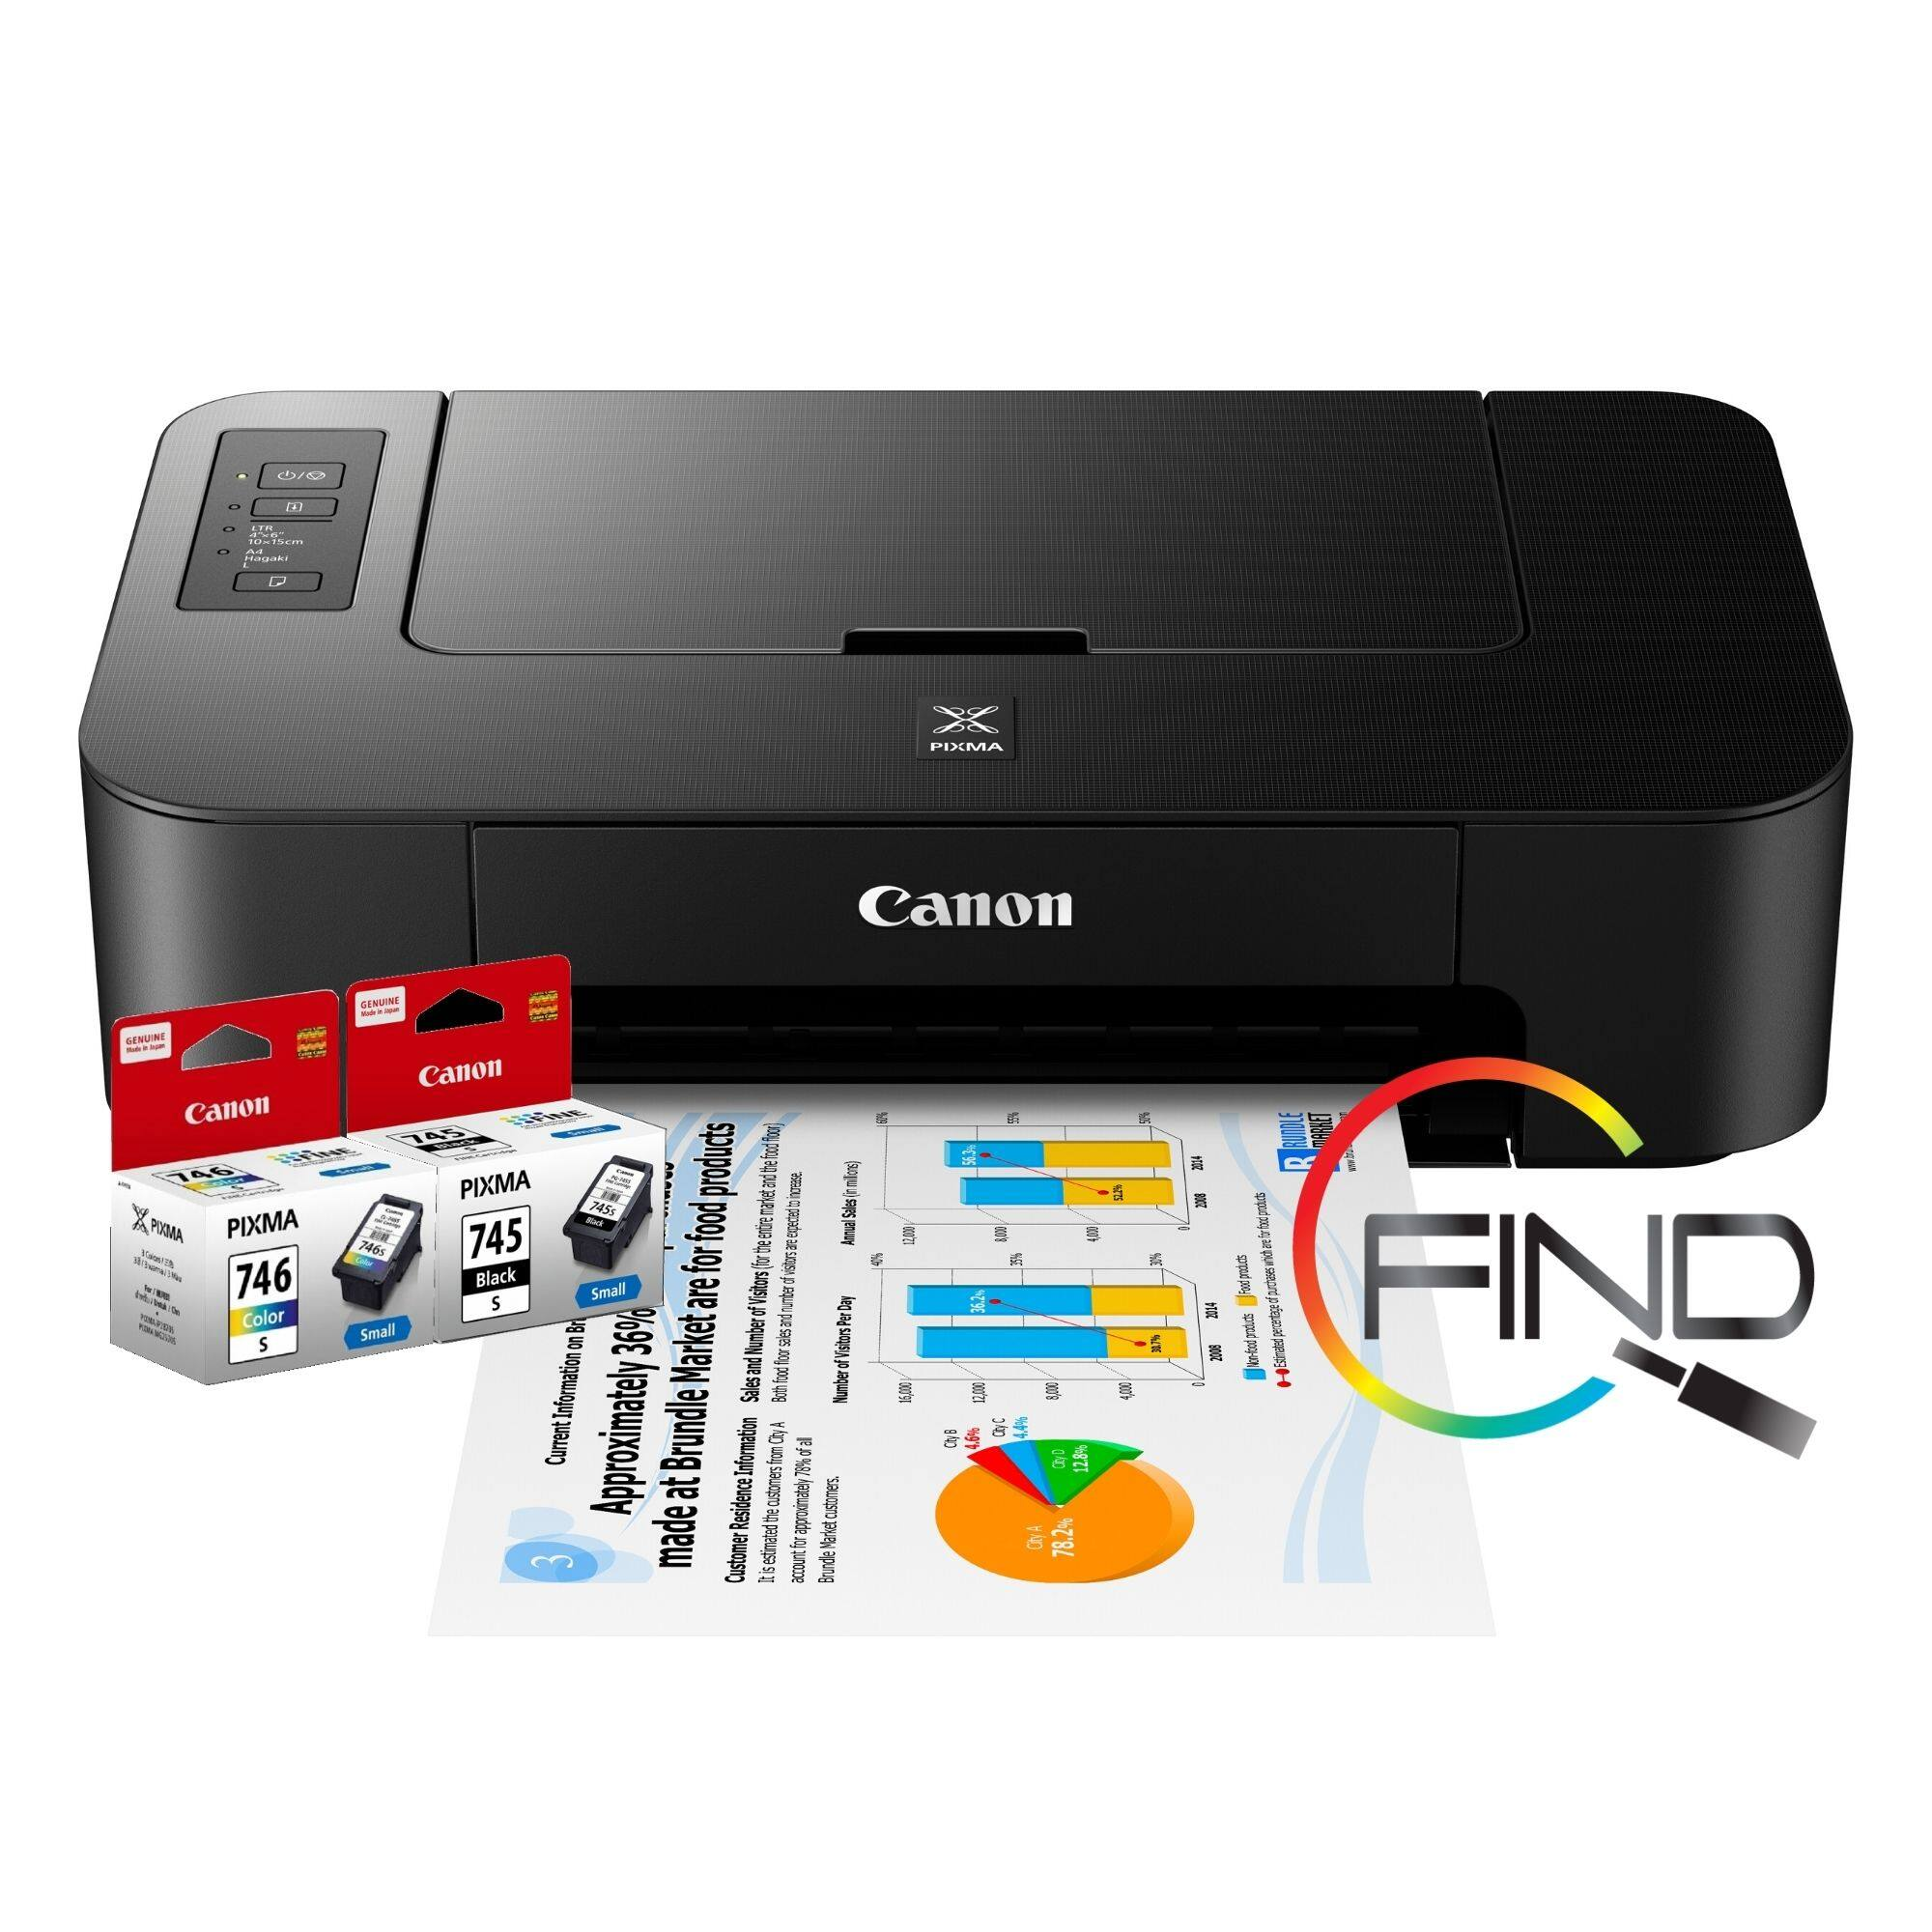 CANON PIXMA TS207 SINGLE-FUNCTION PRINTER Support 4R Borderless Photo Printing (FINDC)